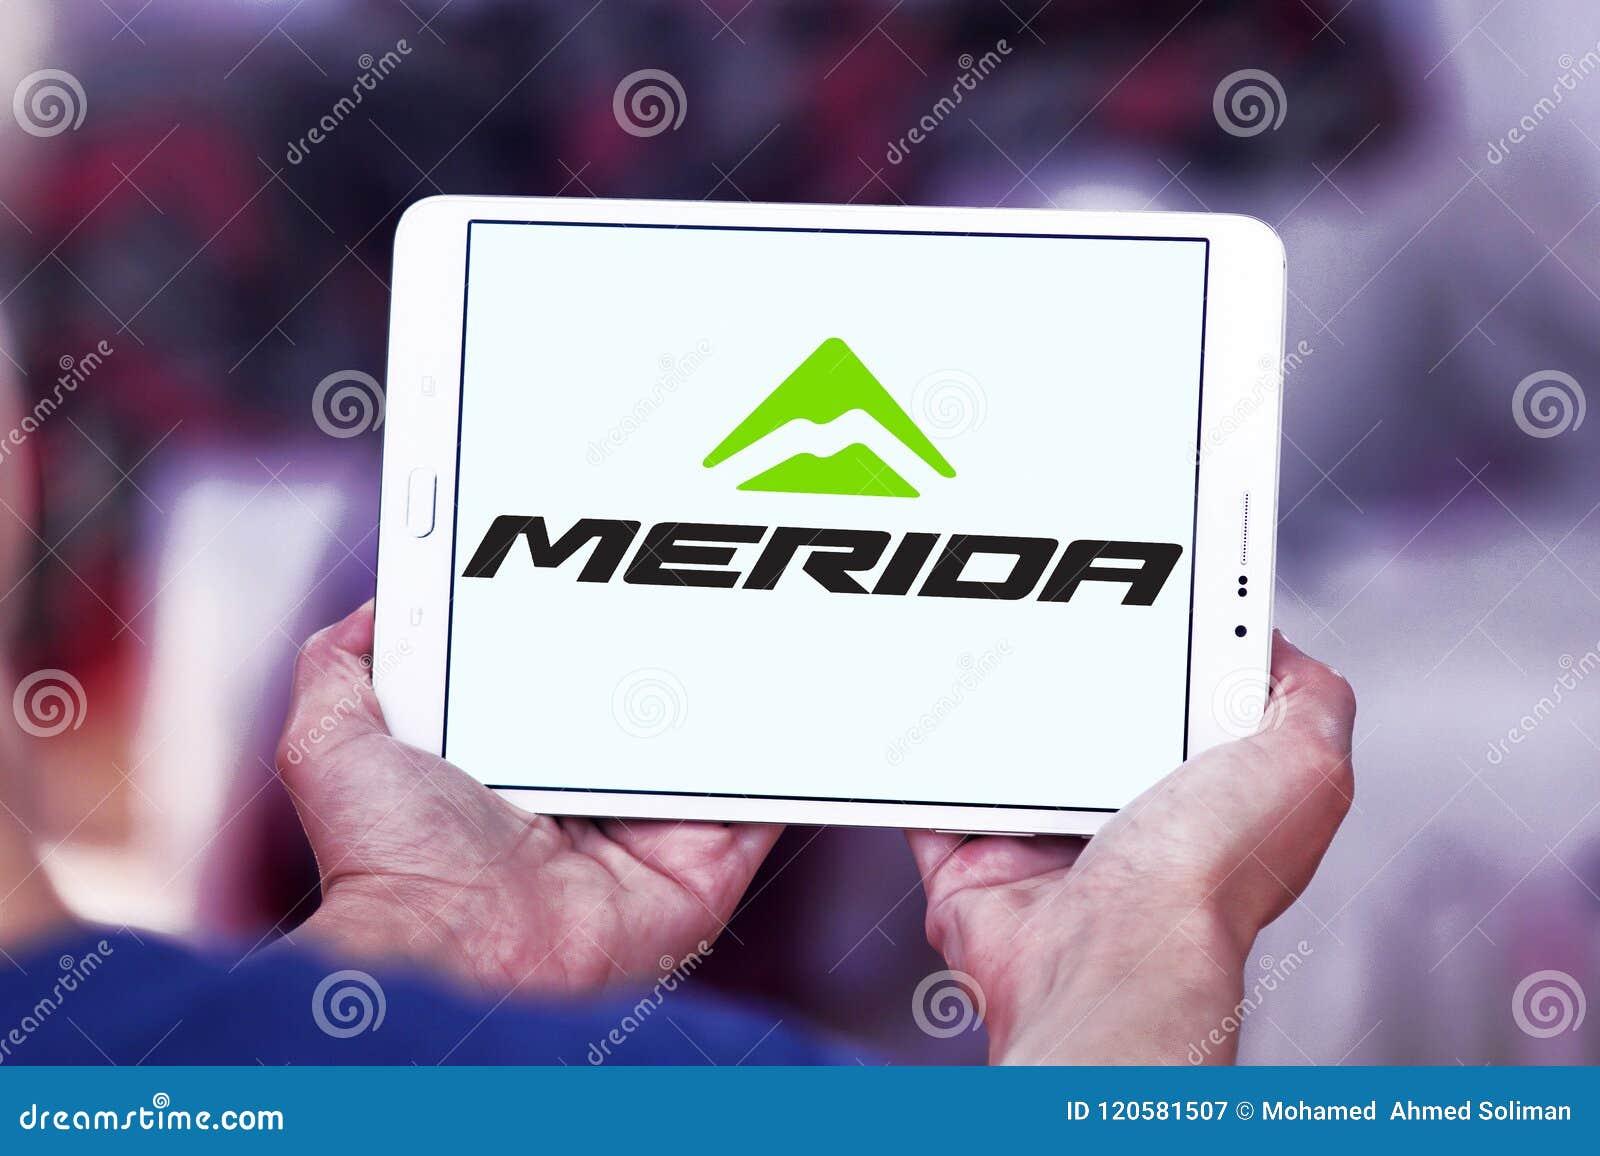 Merida Bikes company logo editorial photography  Image of